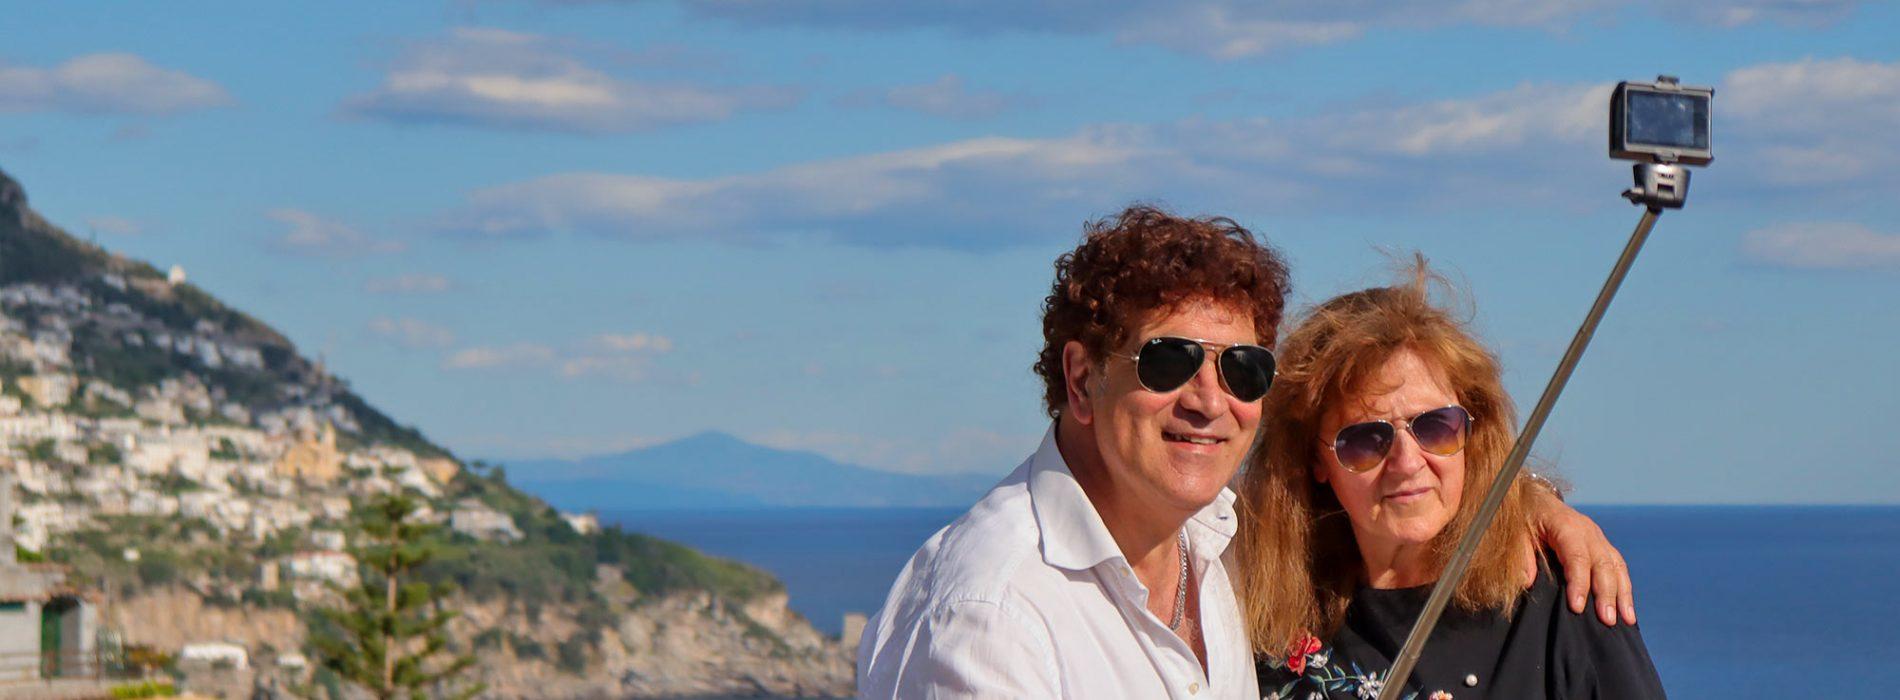 Shore Excursion amalfi coast from Naples